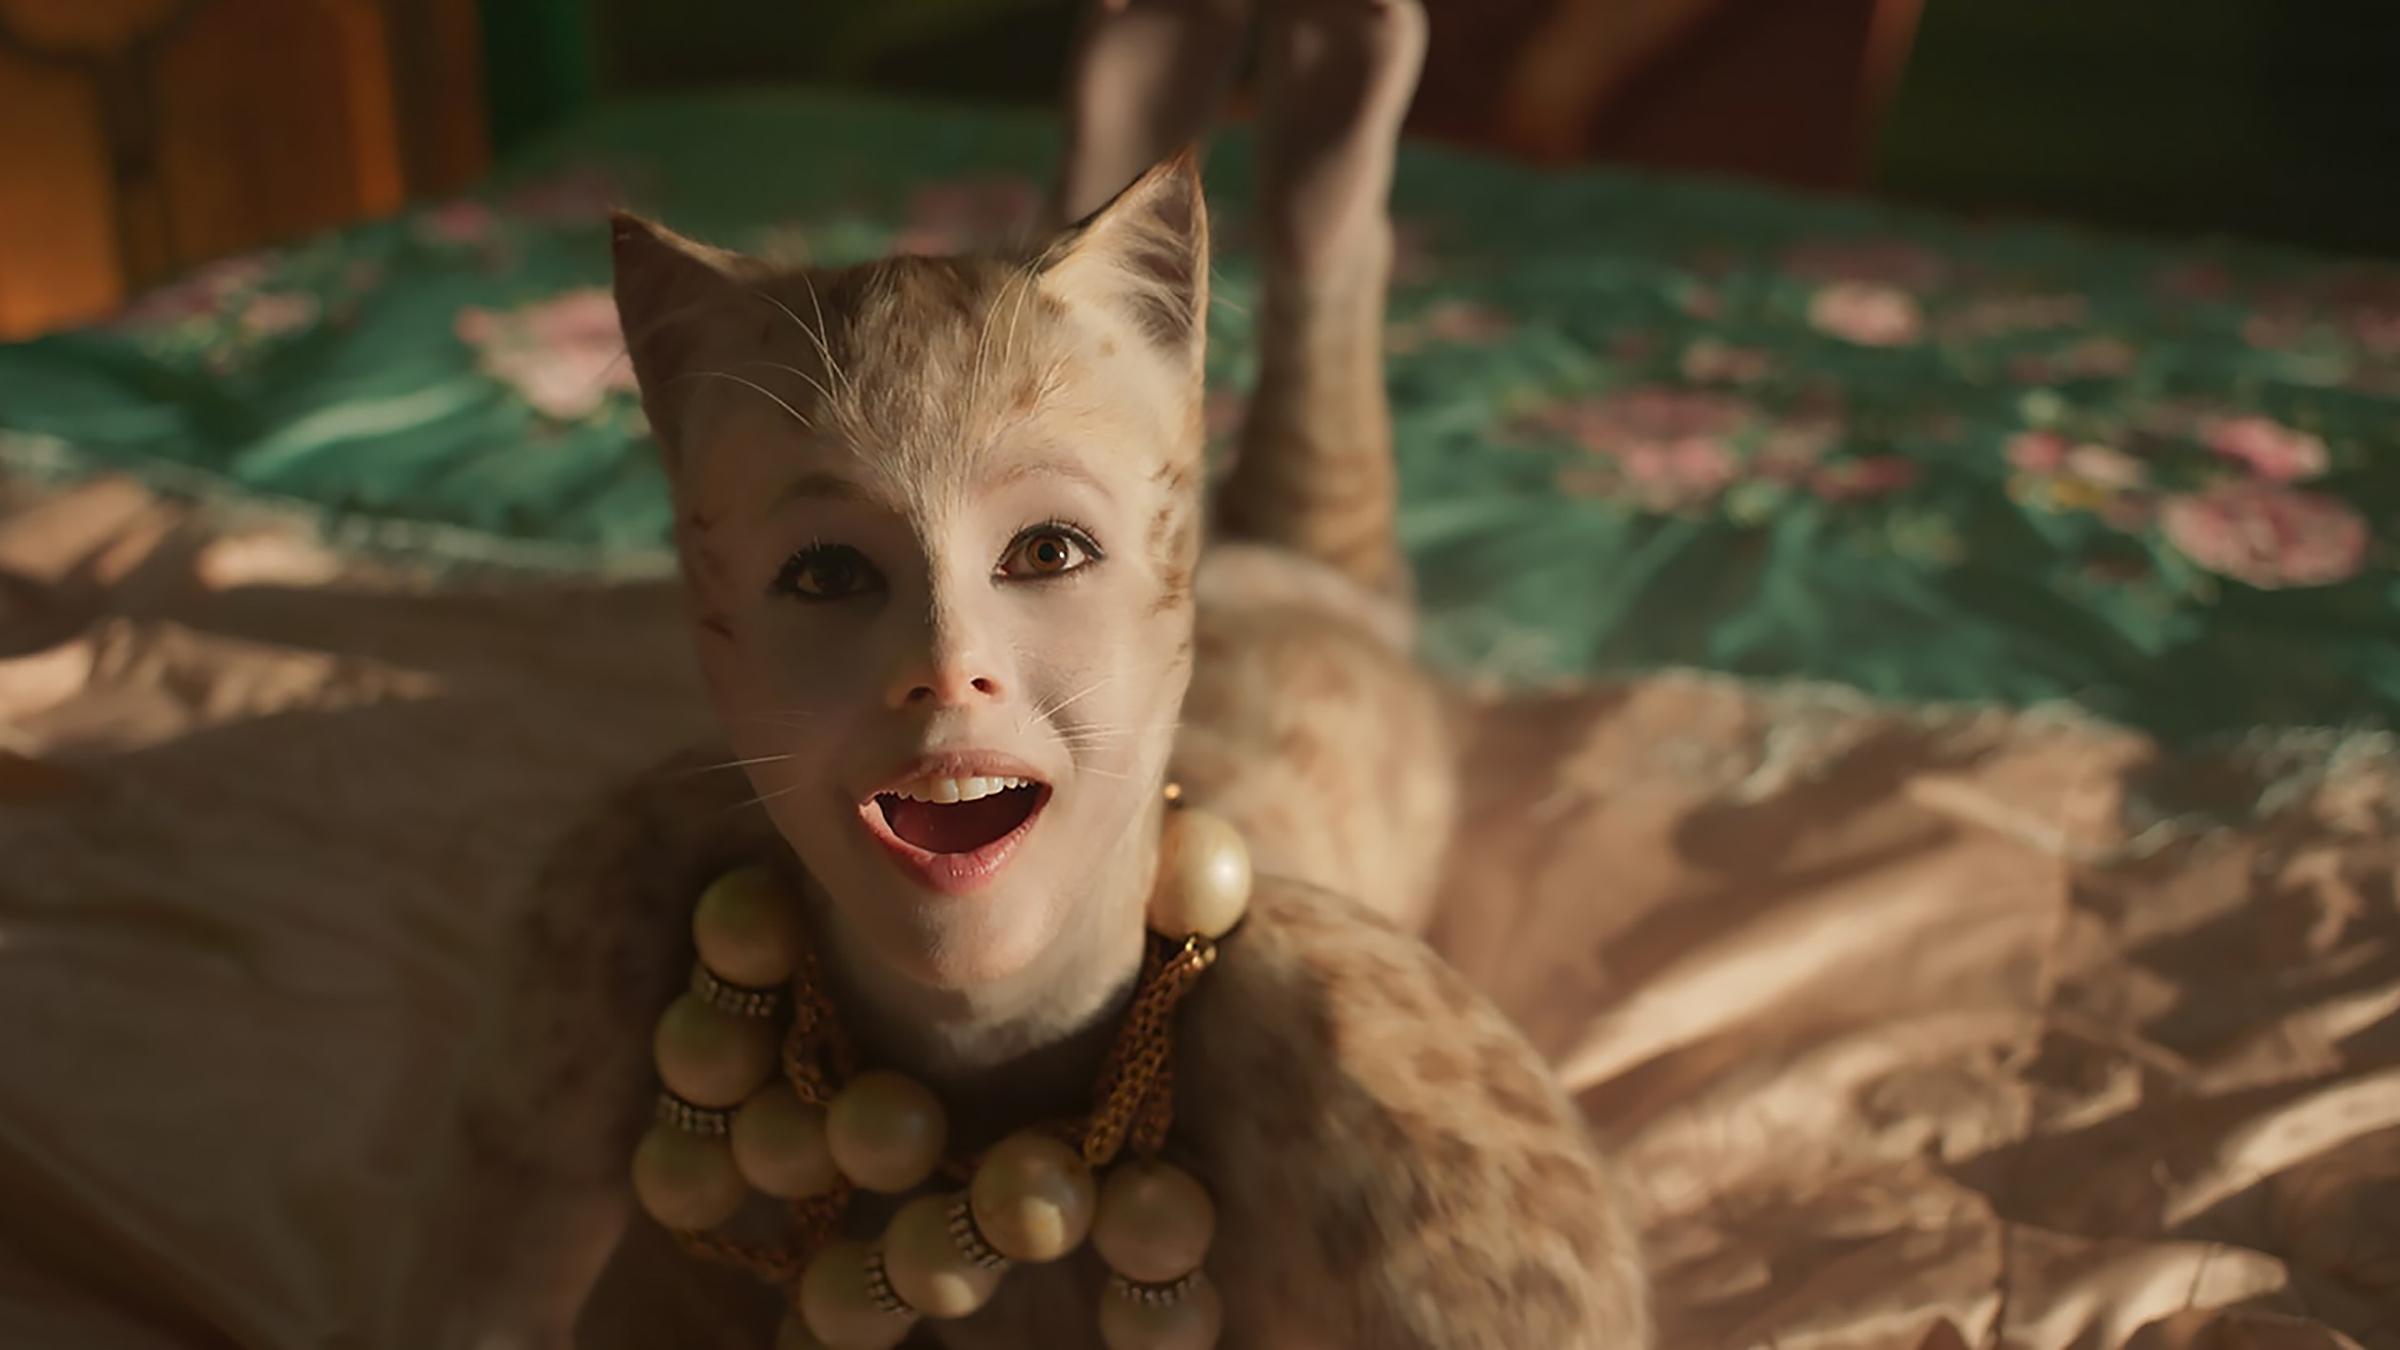 Cats the movie is getting updated graphics \u2014 Quartz